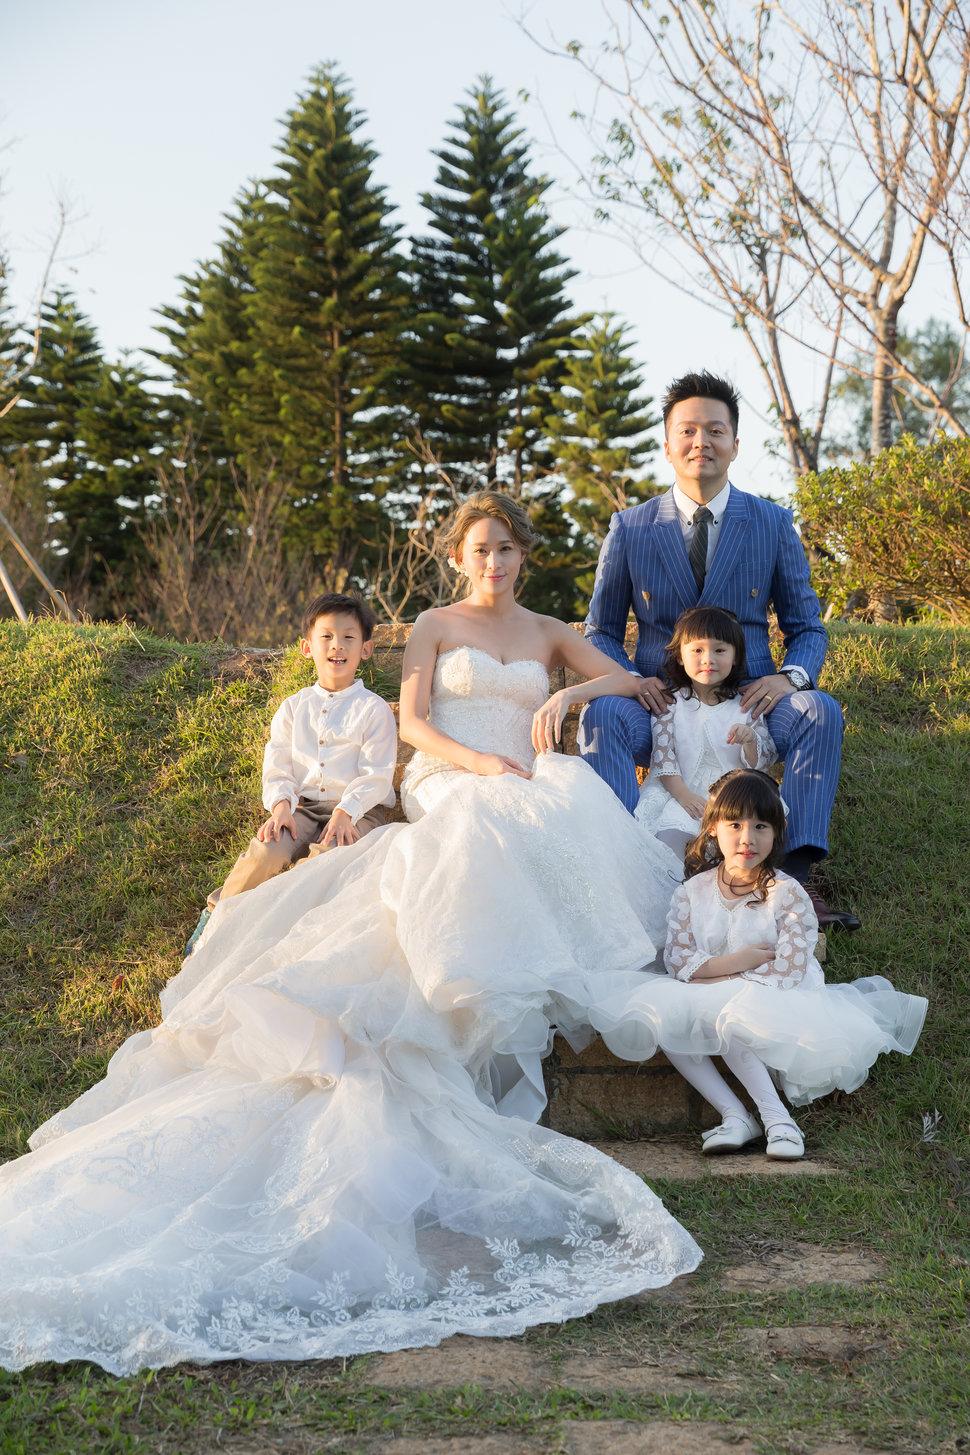 KUBA4912 - 野孩子攝影工作室《結婚吧》